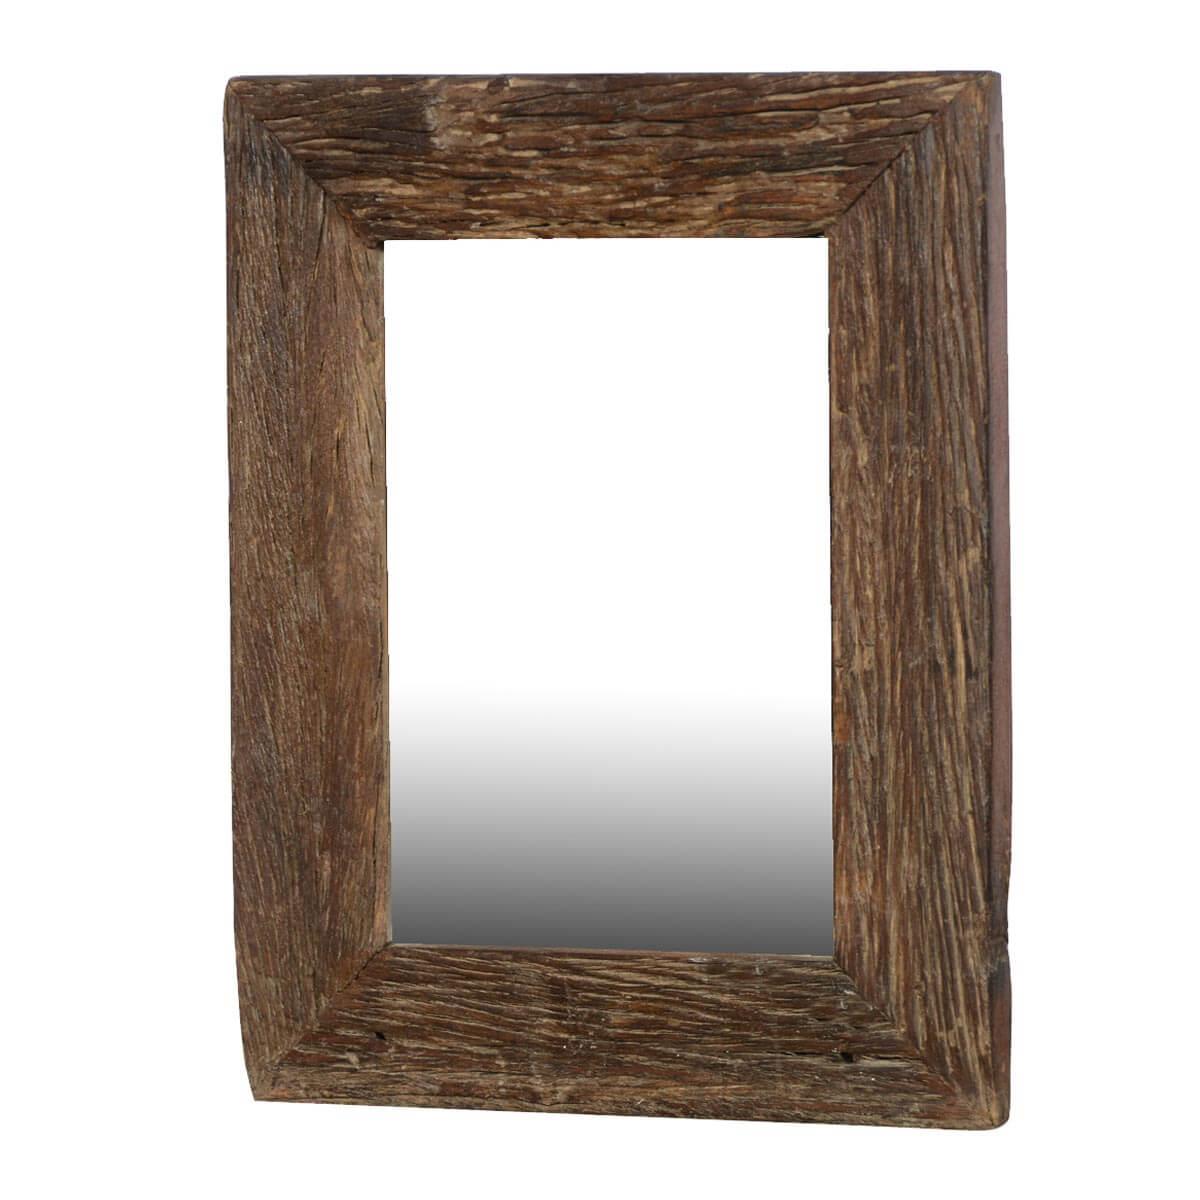 Appalachian Rustic Reclaimed Wood 23.5 Wall Mirror Frame